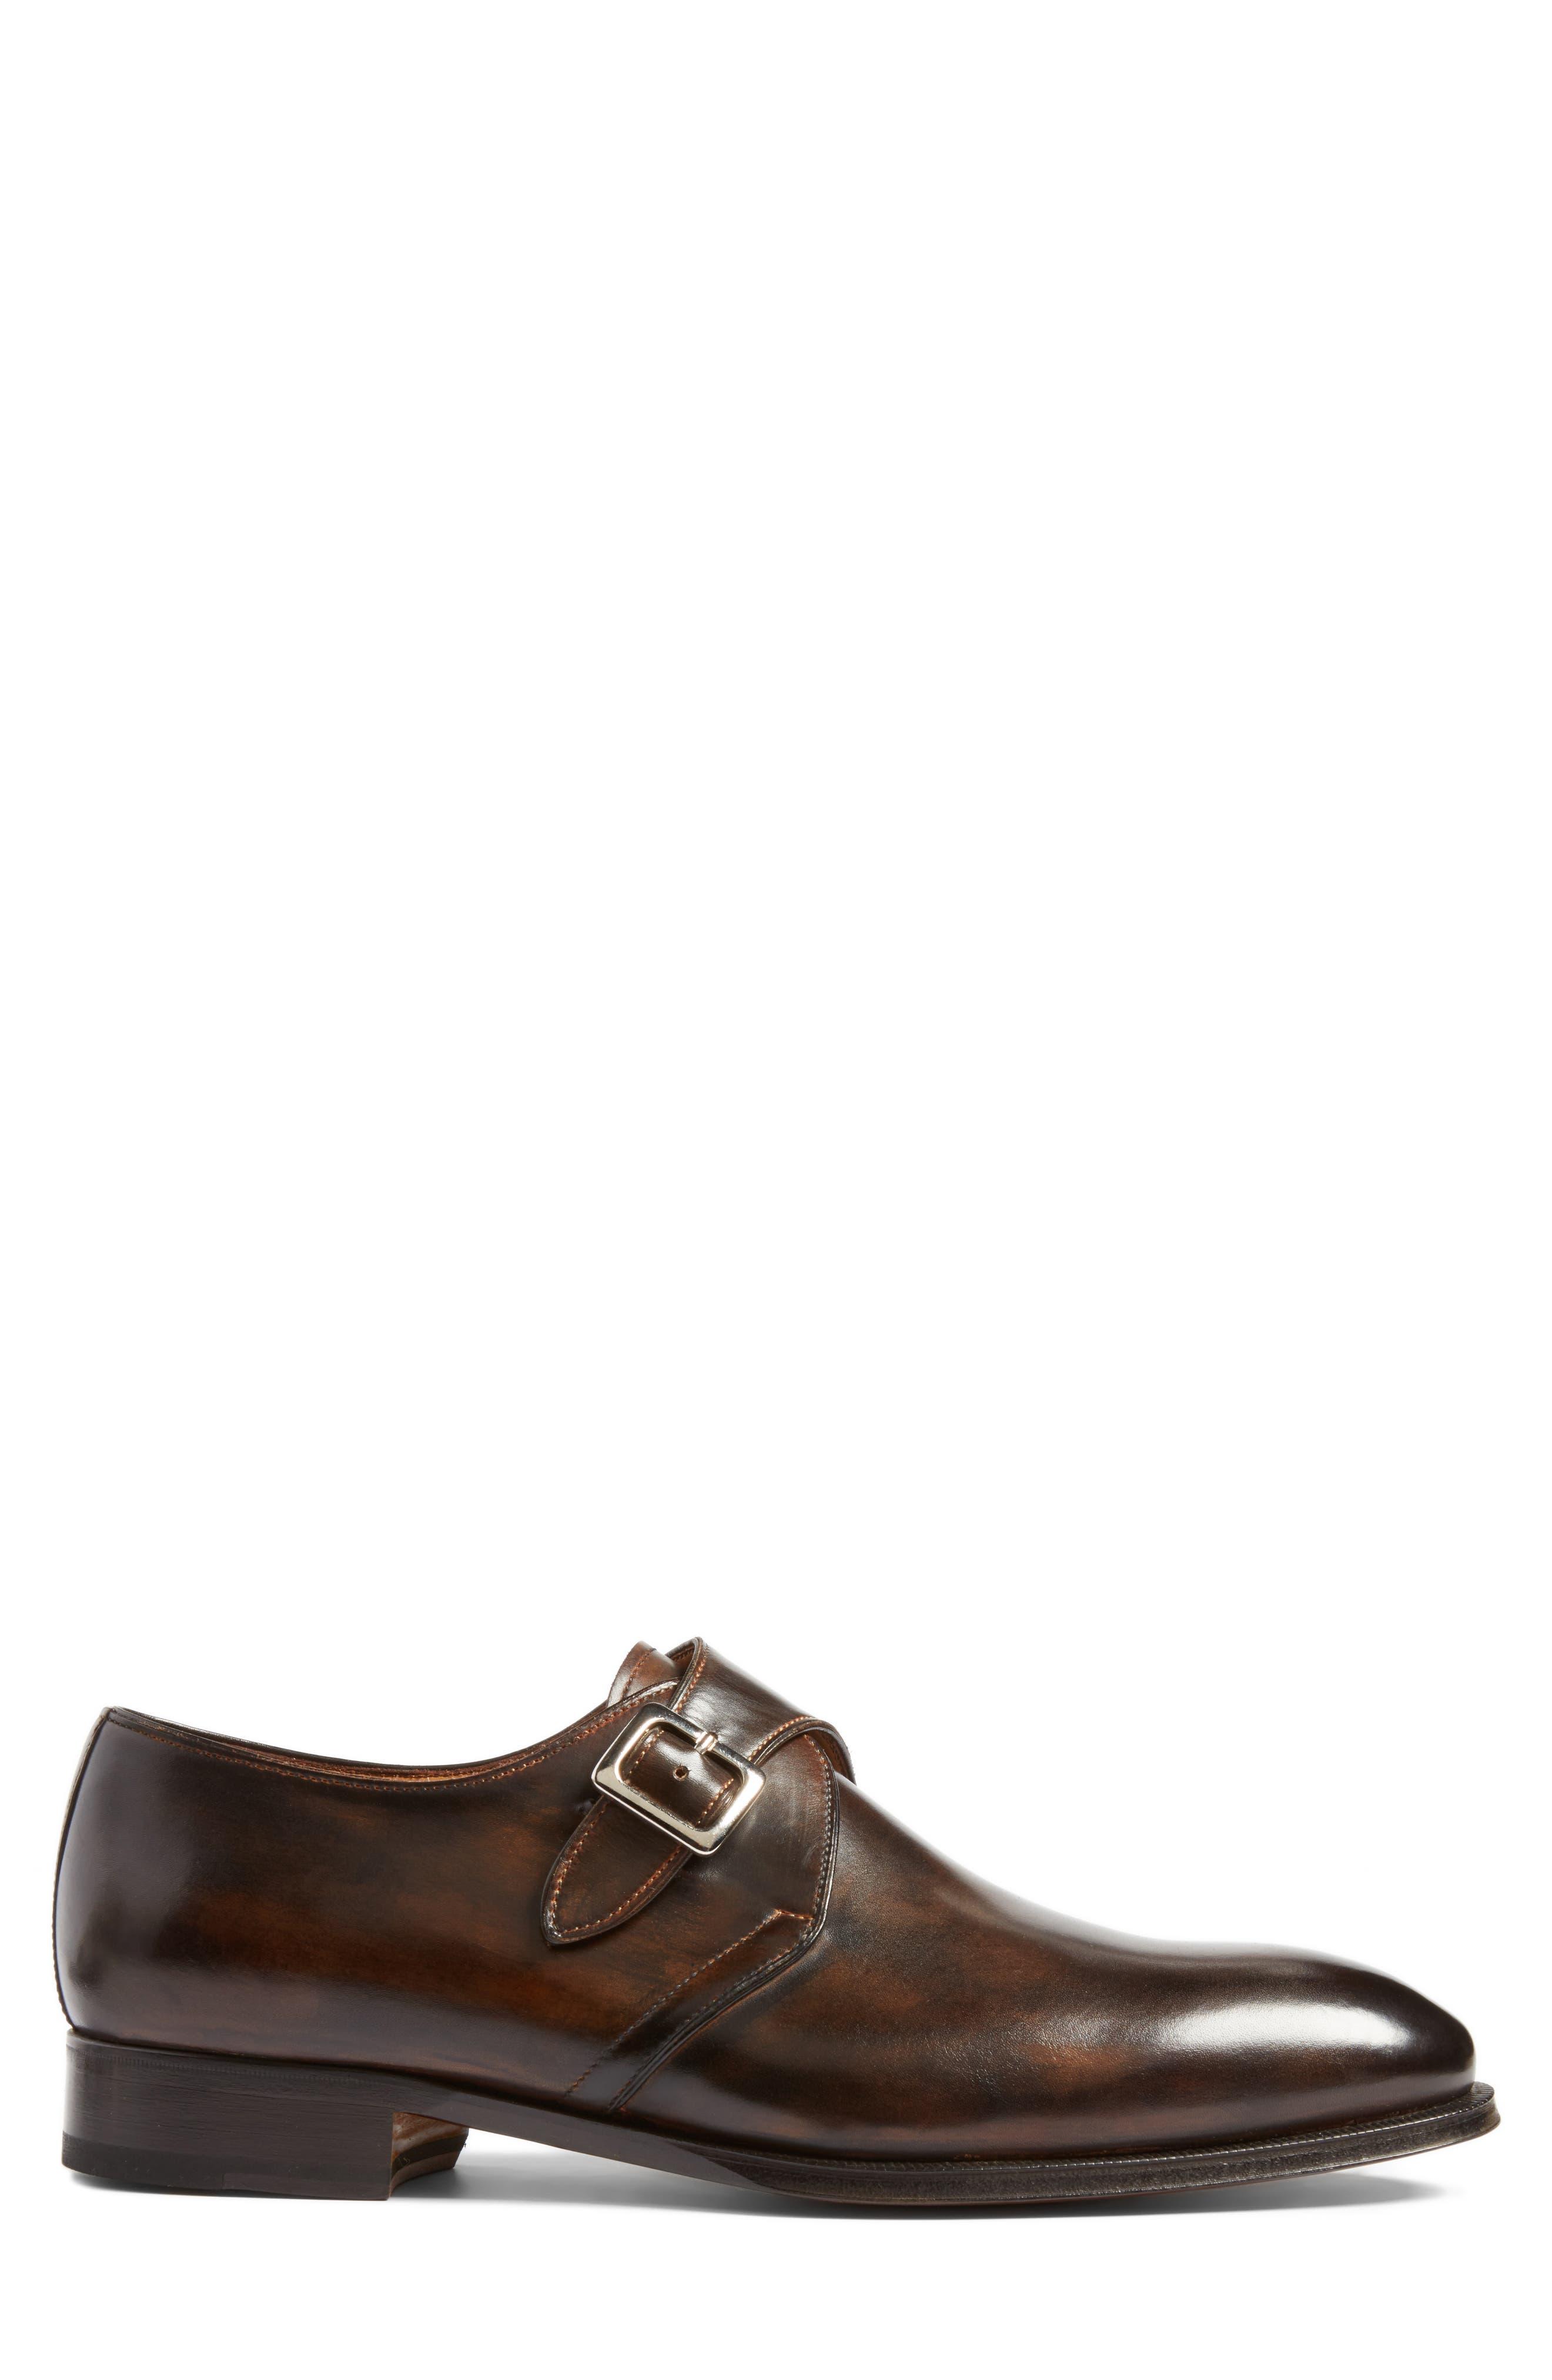 Monk Strap Shoe,                             Alternate thumbnail 3, color,                             Brown